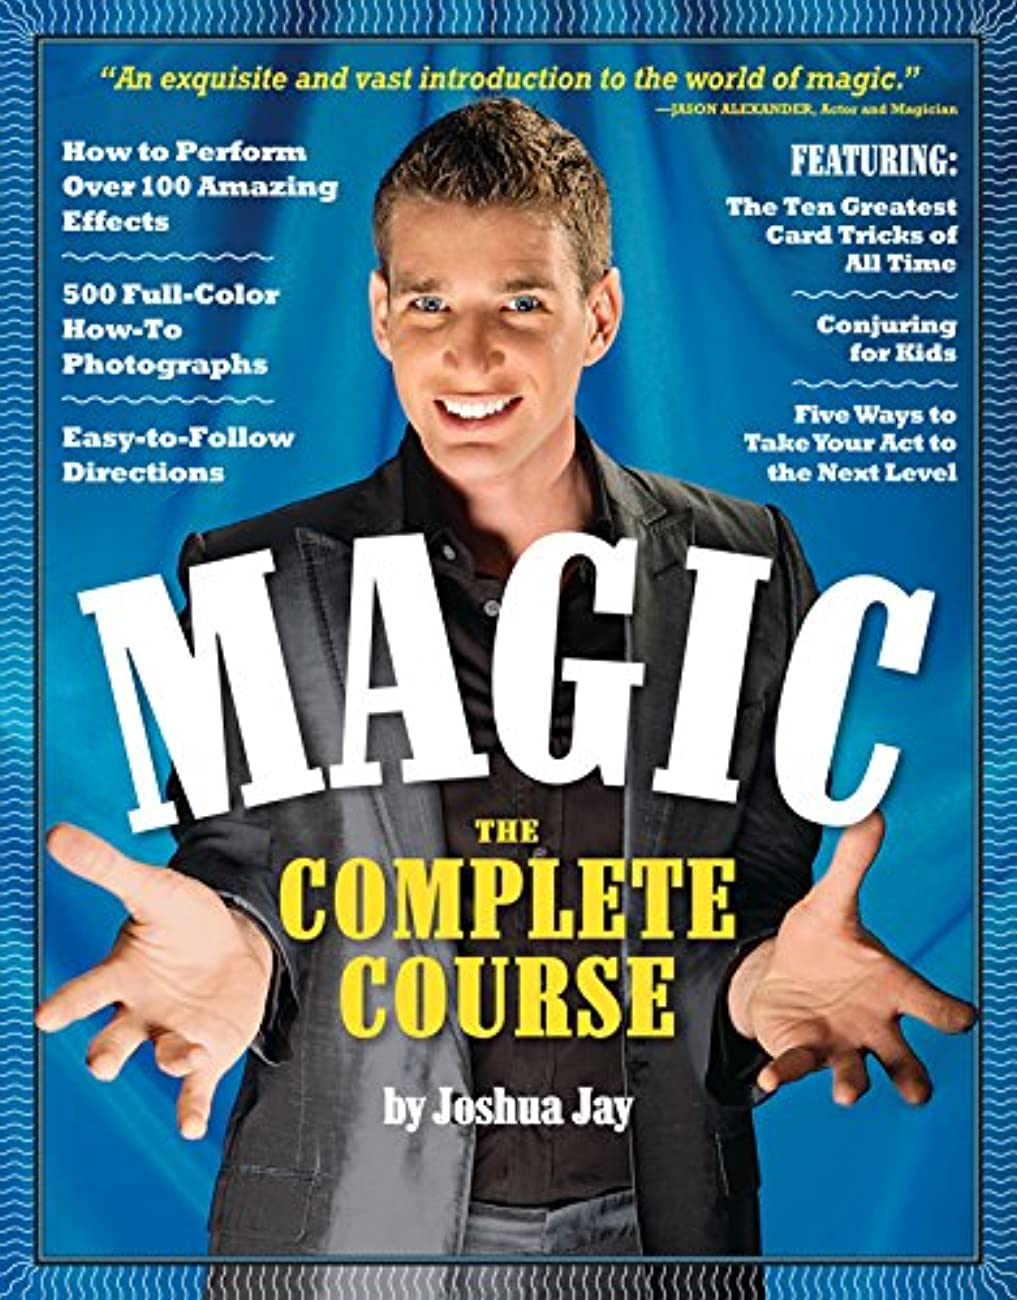 Magic: The Complete Course (eBook) (English Edition)